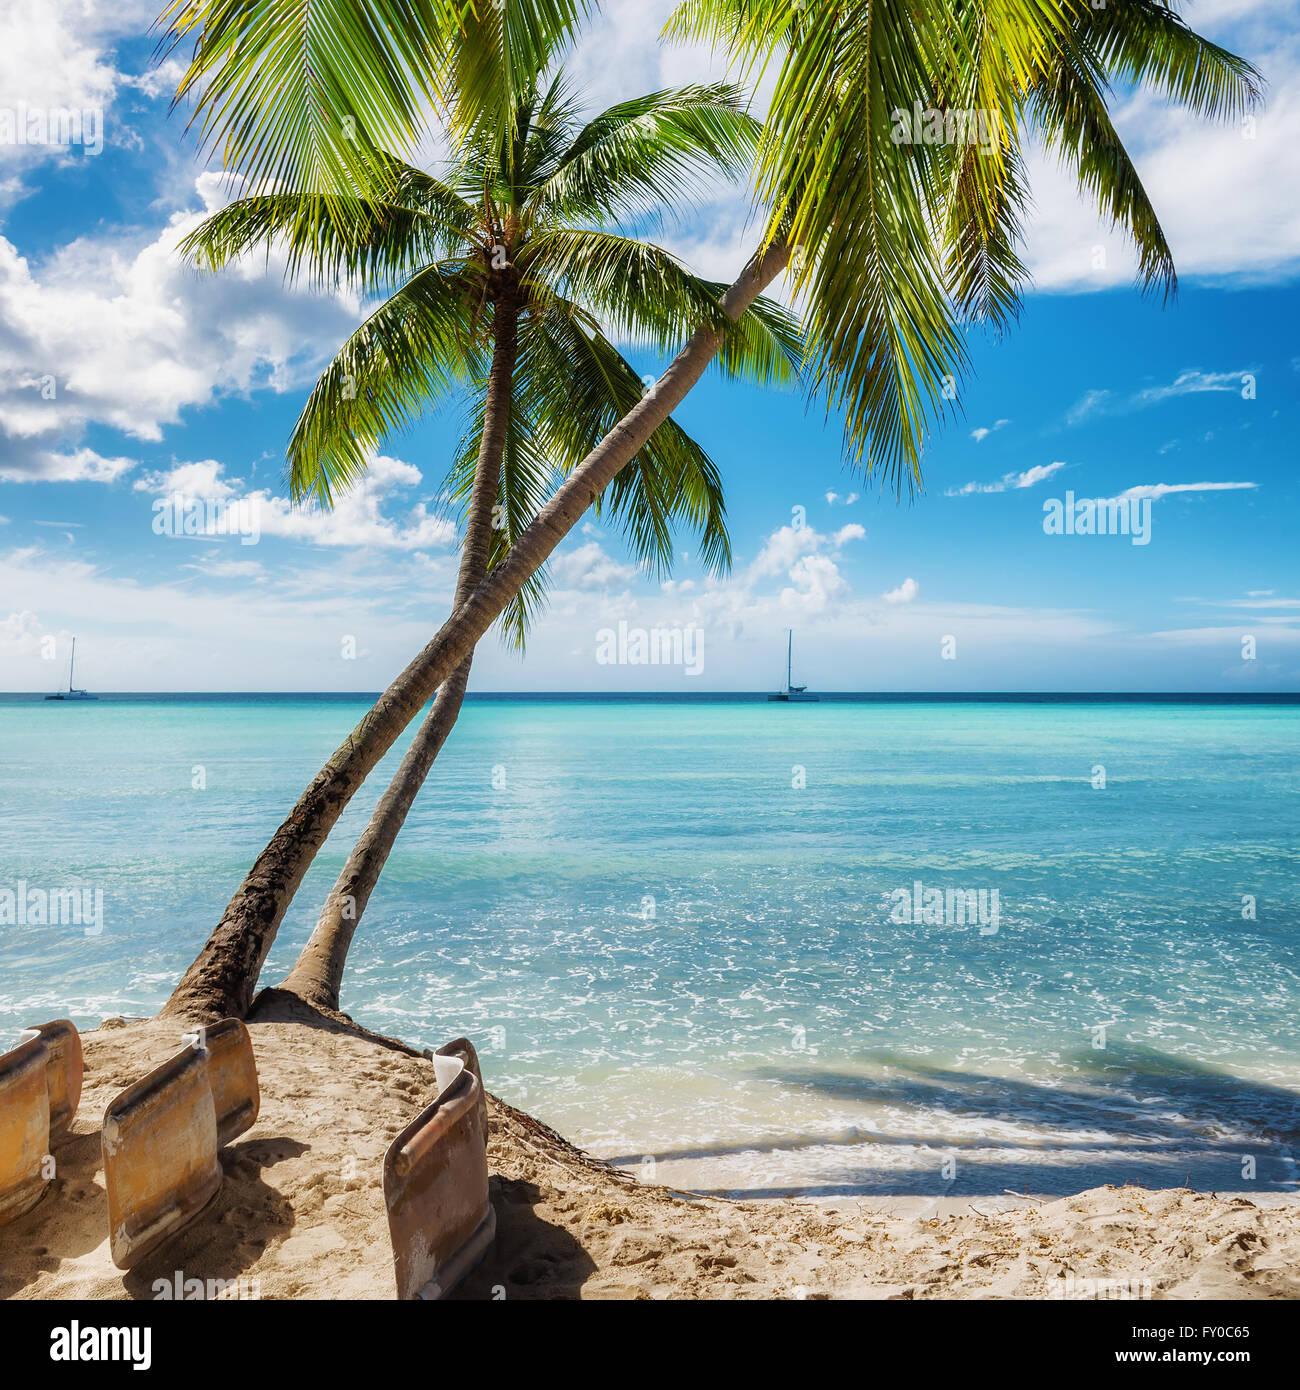 Palm beach in Saona island, Dominican Republic - Stock Image